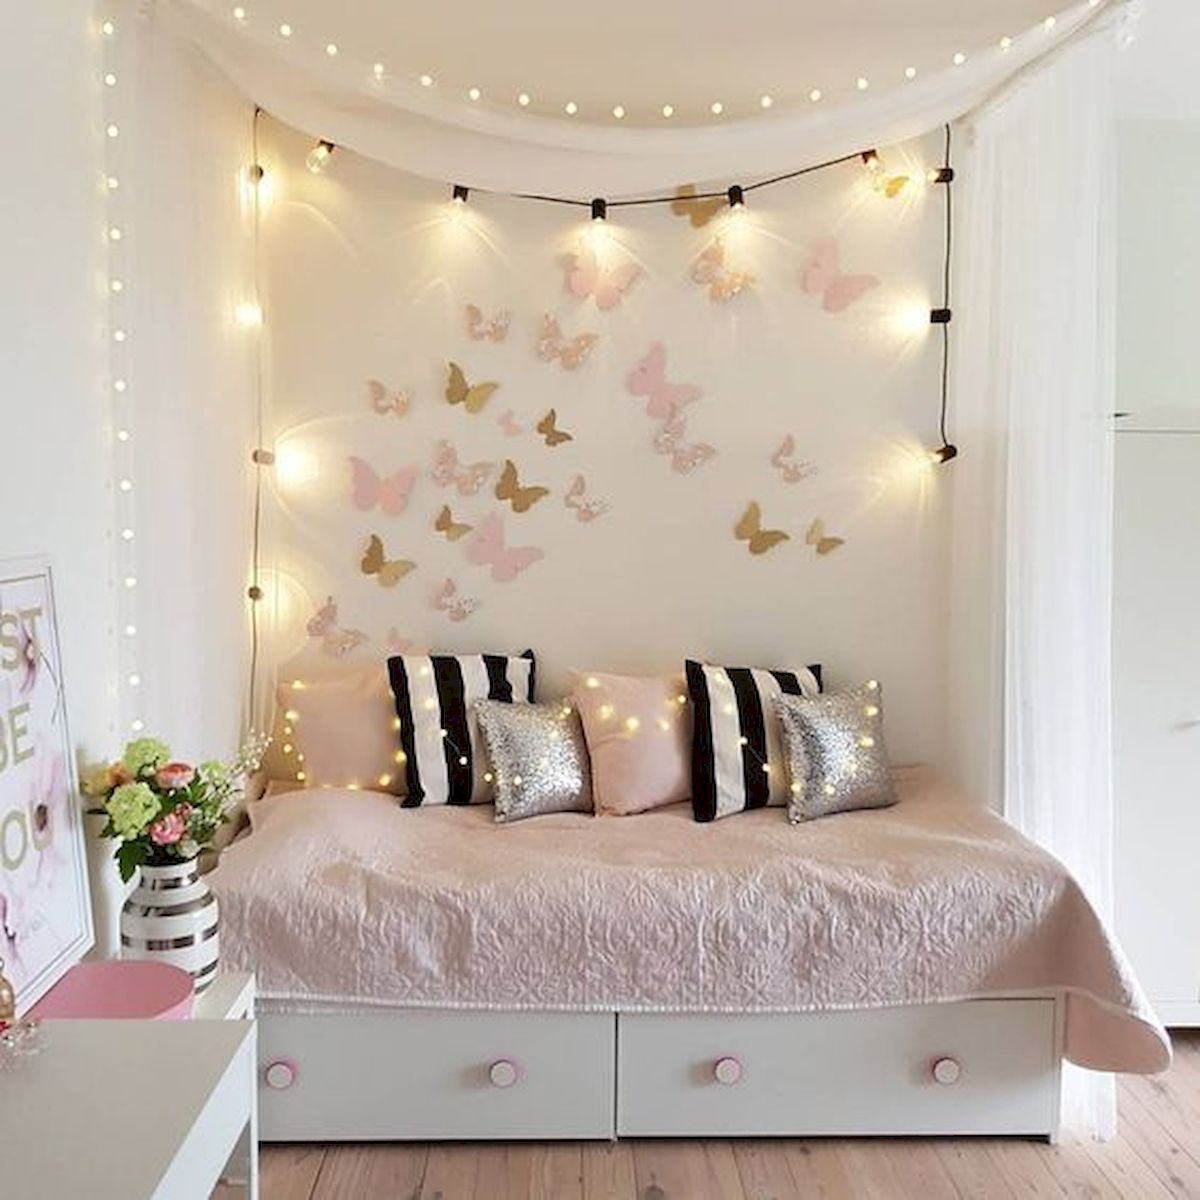 22 Best DIY Crafts for Bedroom Walls (5)